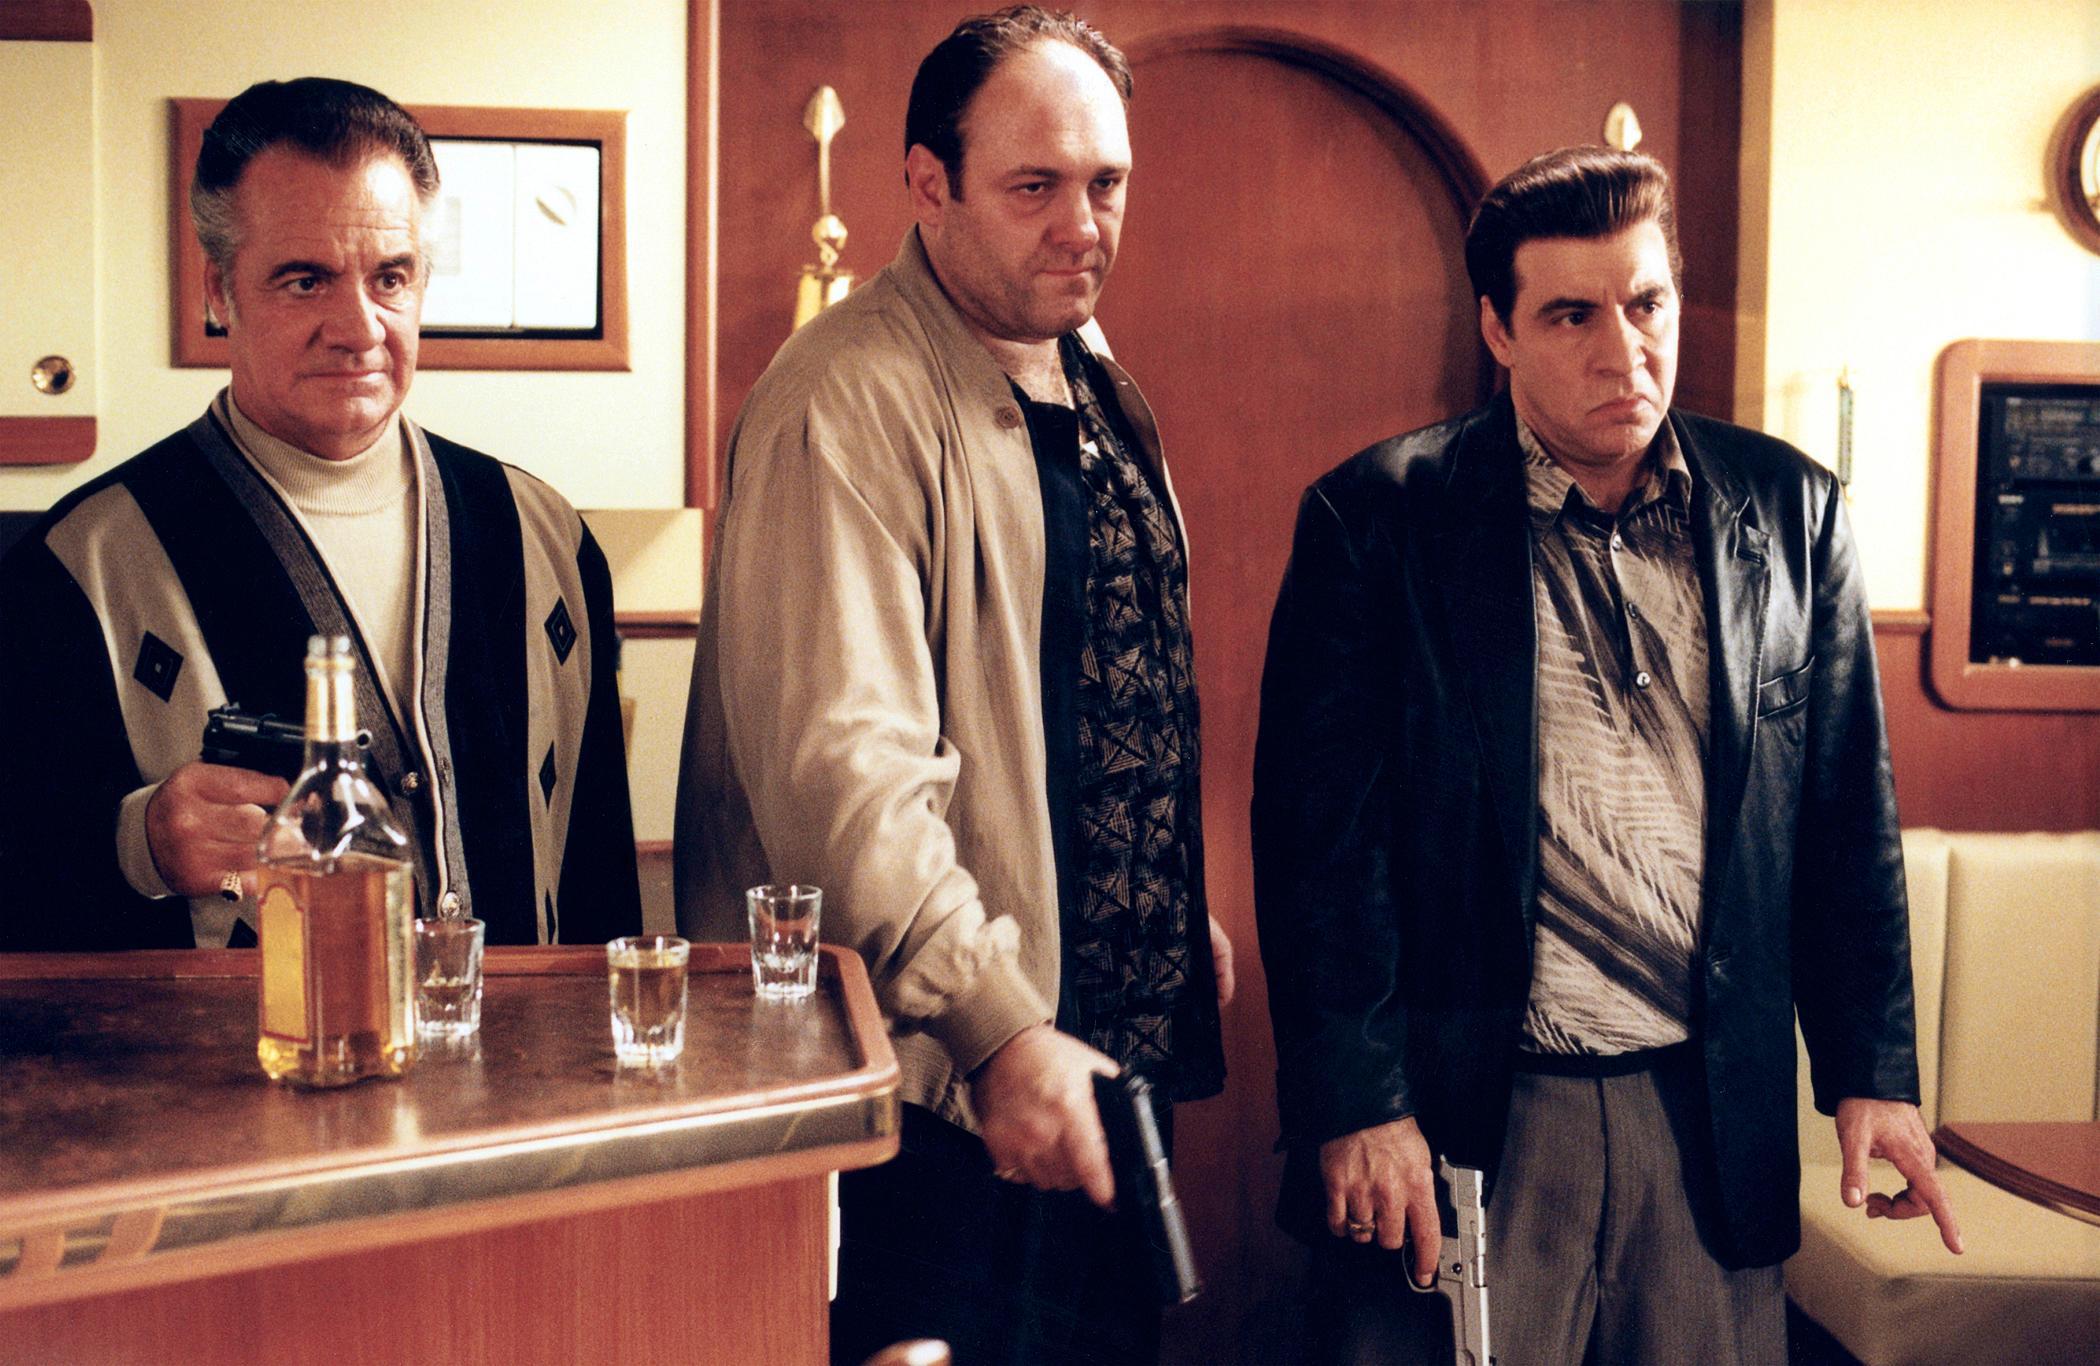 THE SOPRANOS, Tony Sirico, James Gandolfini, Steven Van Zandt, (Season 2, 2000), 1999-2007.